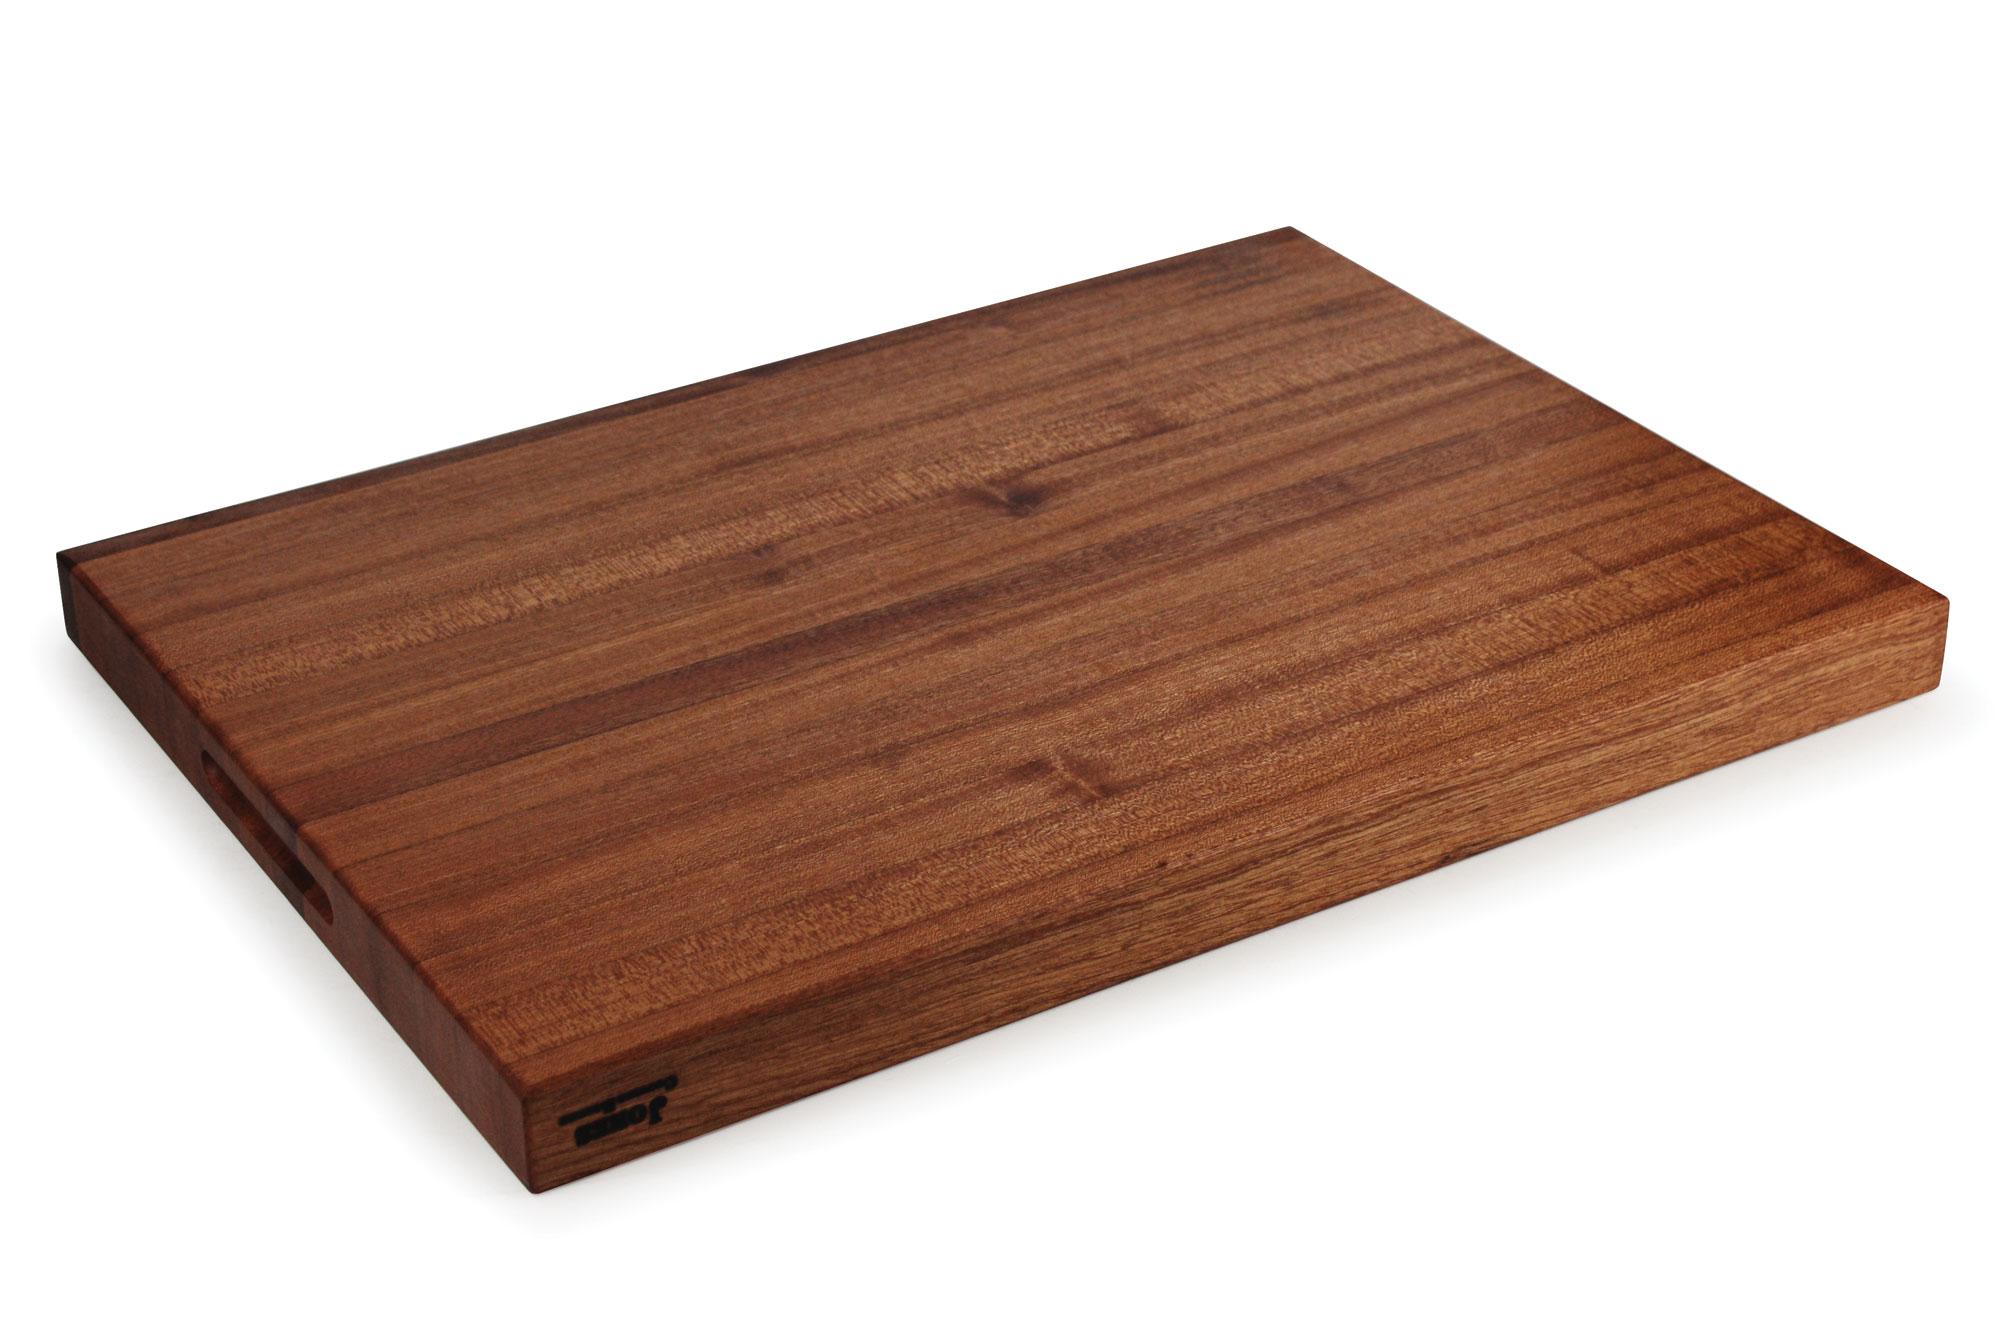 Jones Sapele Edge Grain Cutting Board 22x16x1 5